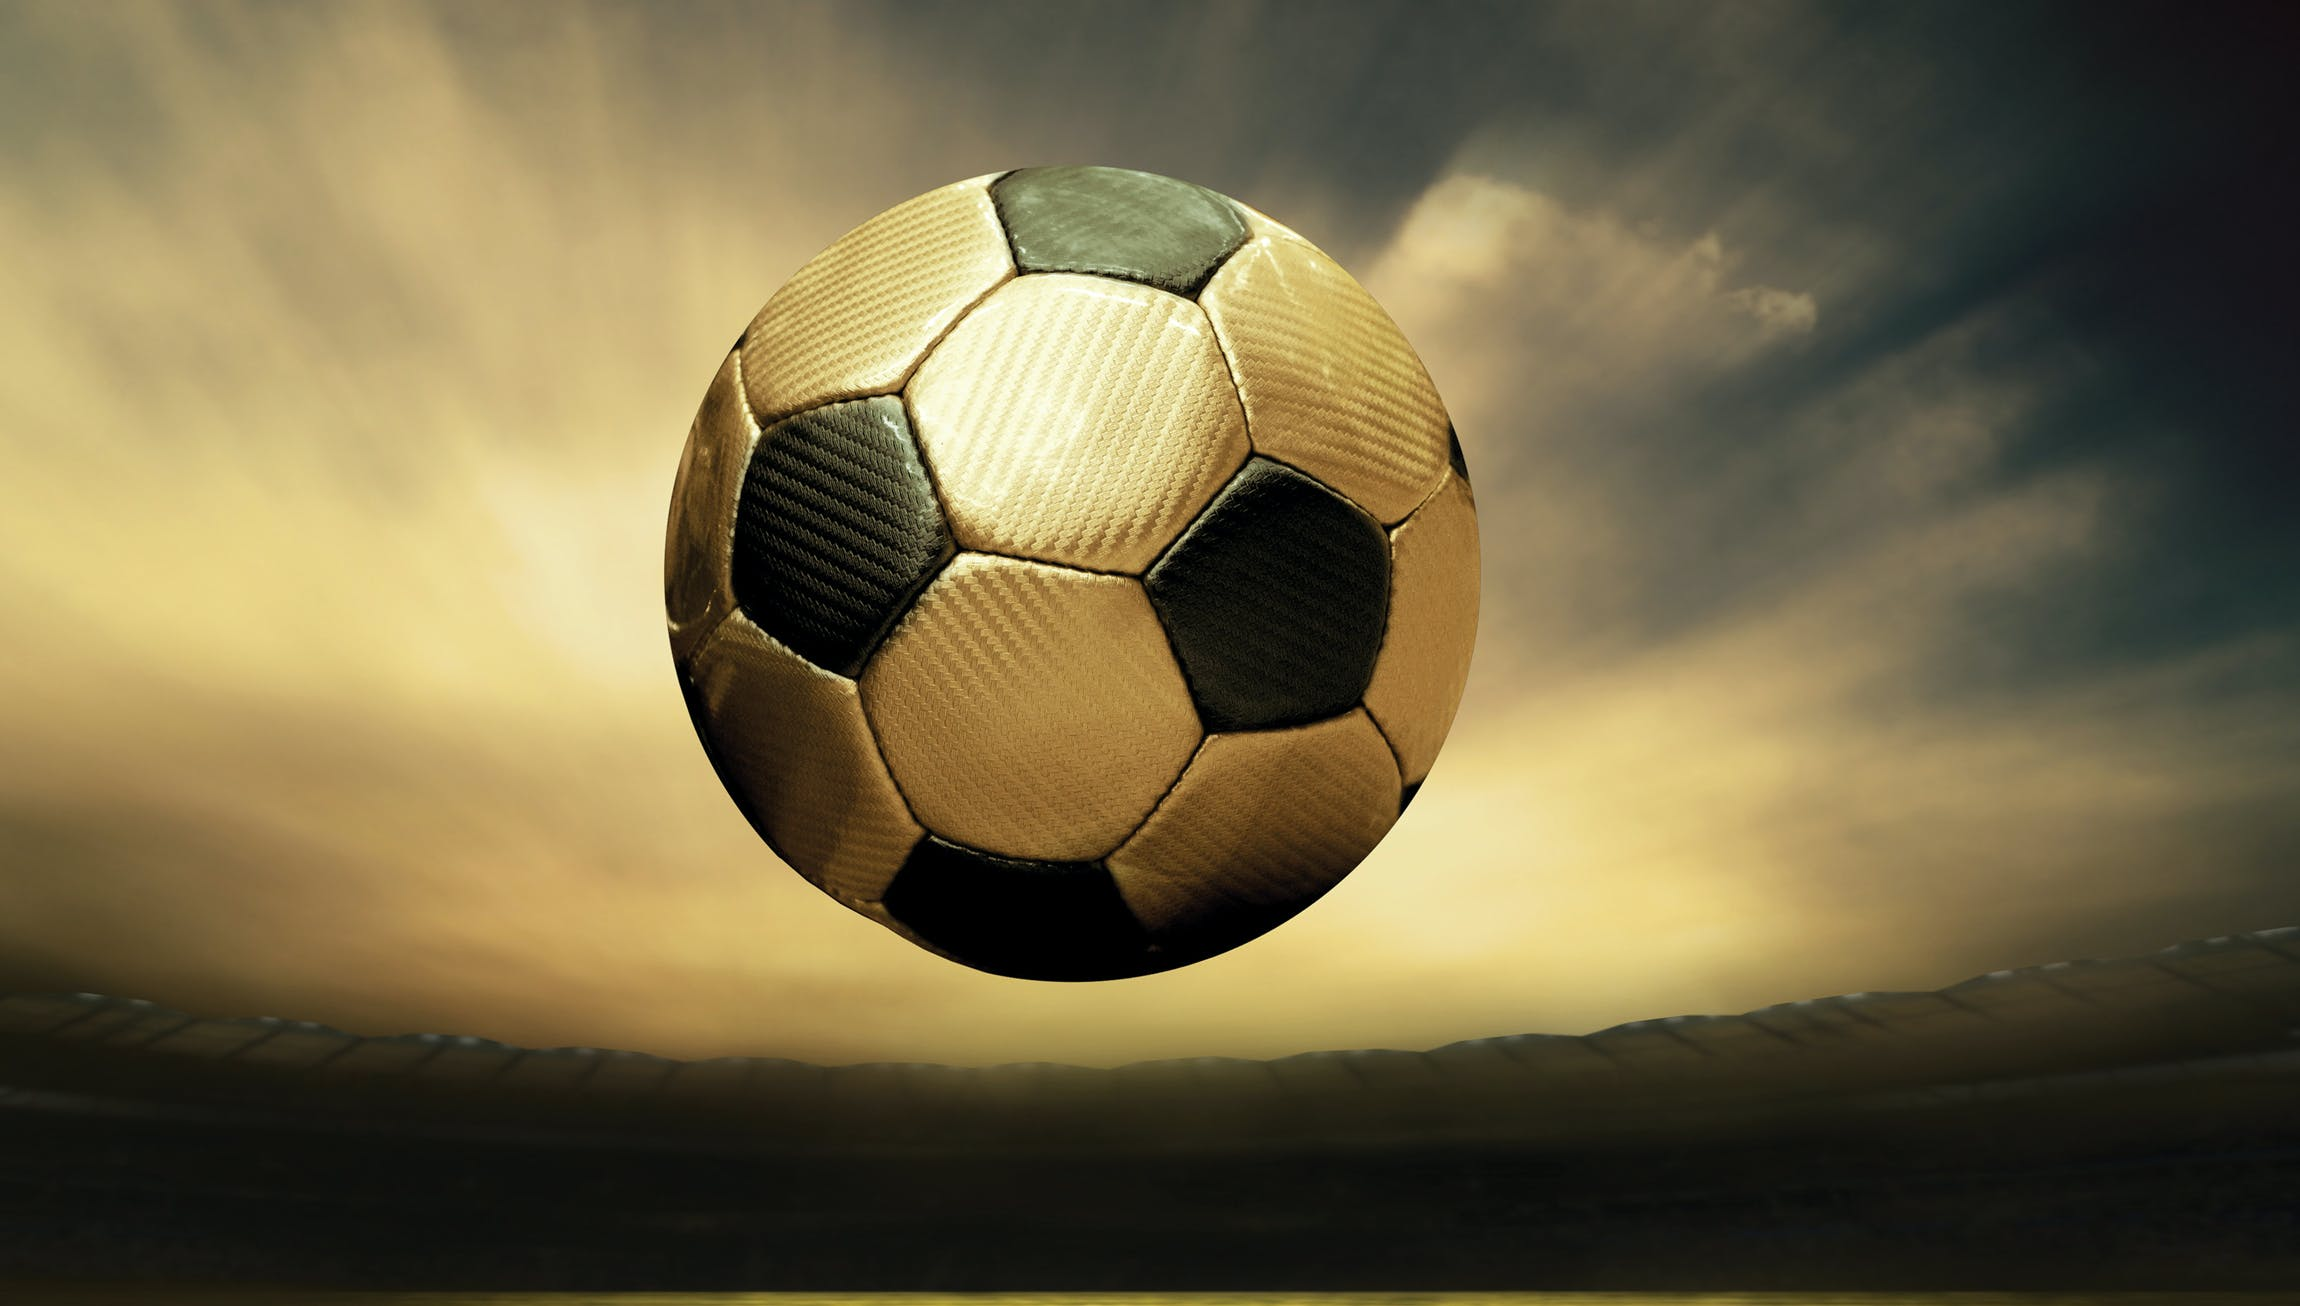 football-fullwidth